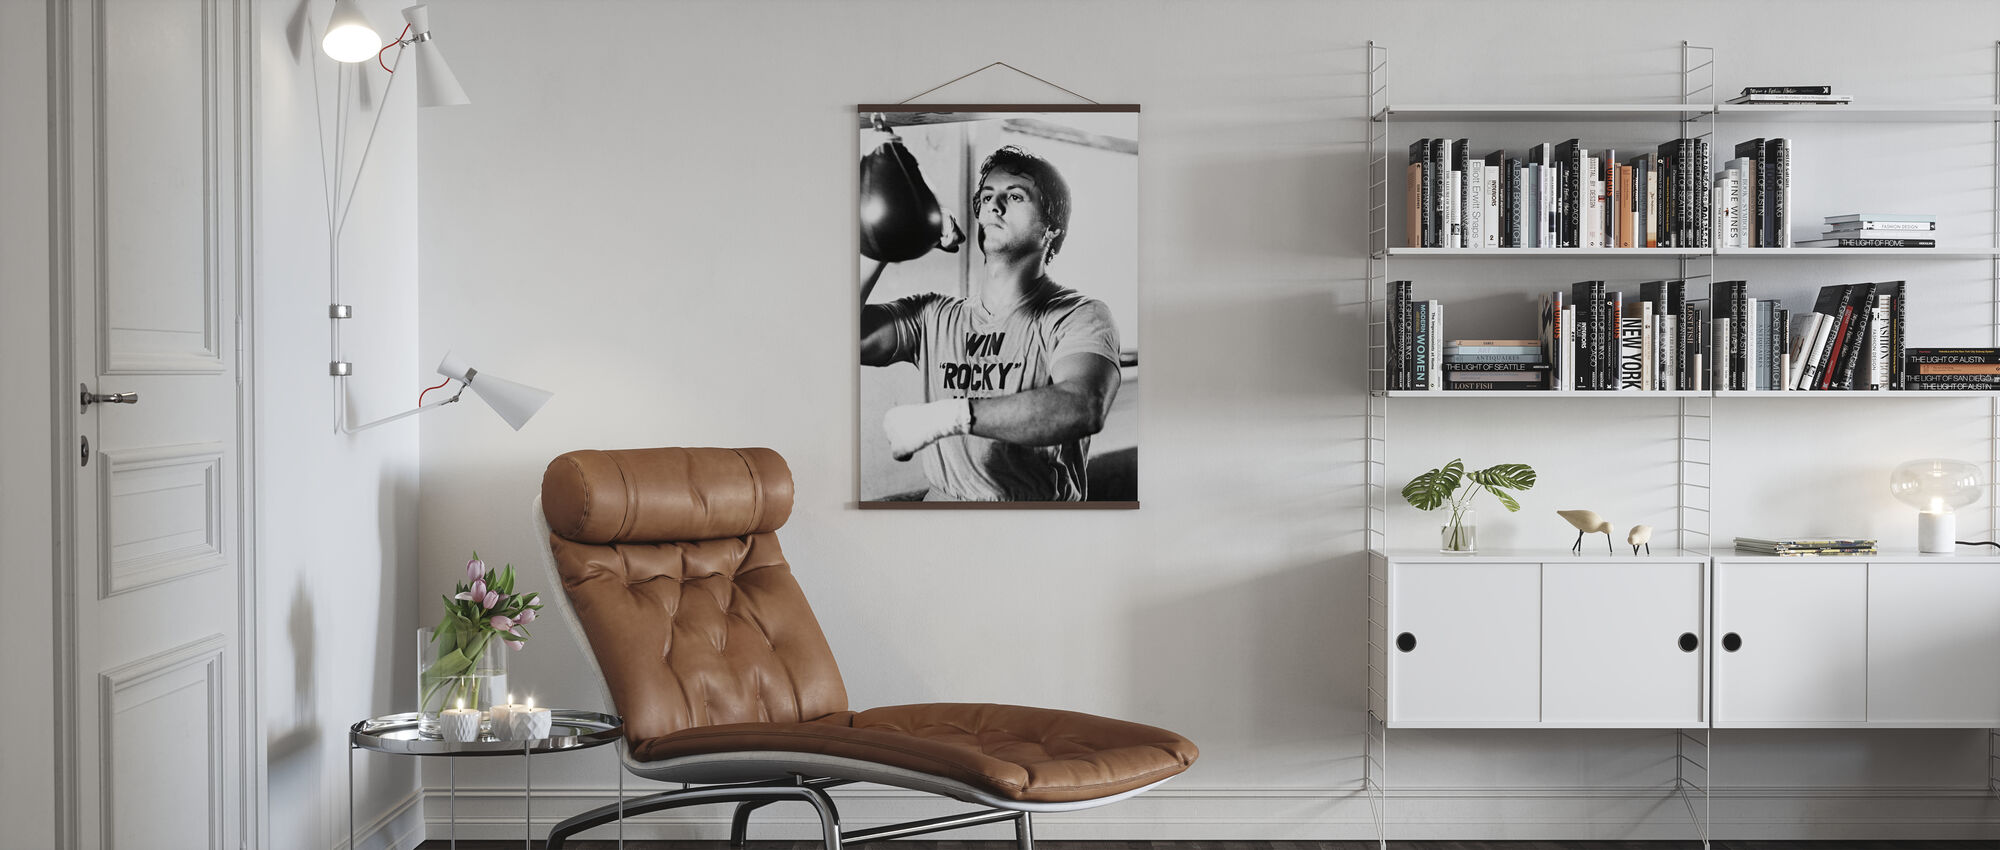 Rocky - Sylvester Stallone - Poster - Living Room